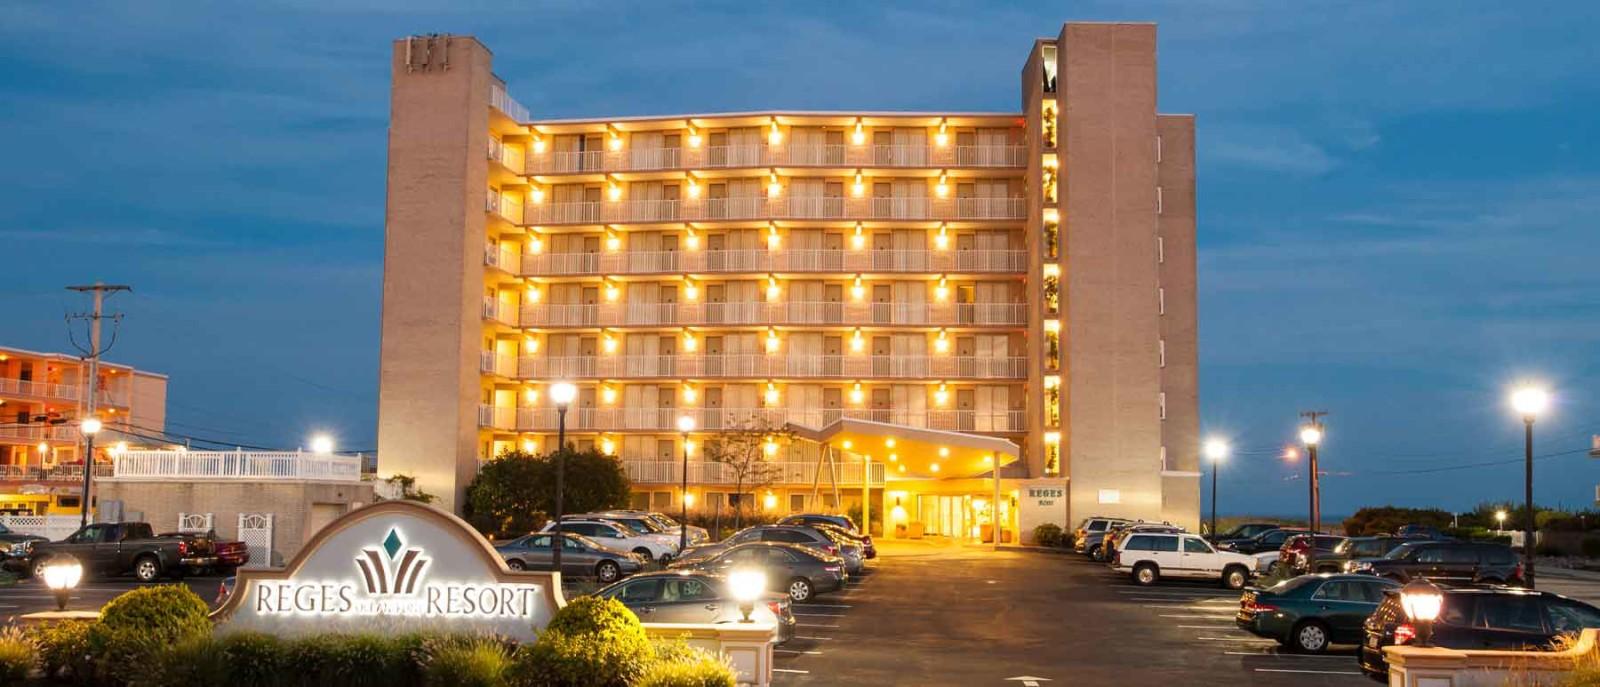 Hotels In Wildwood Rouydadnews Info